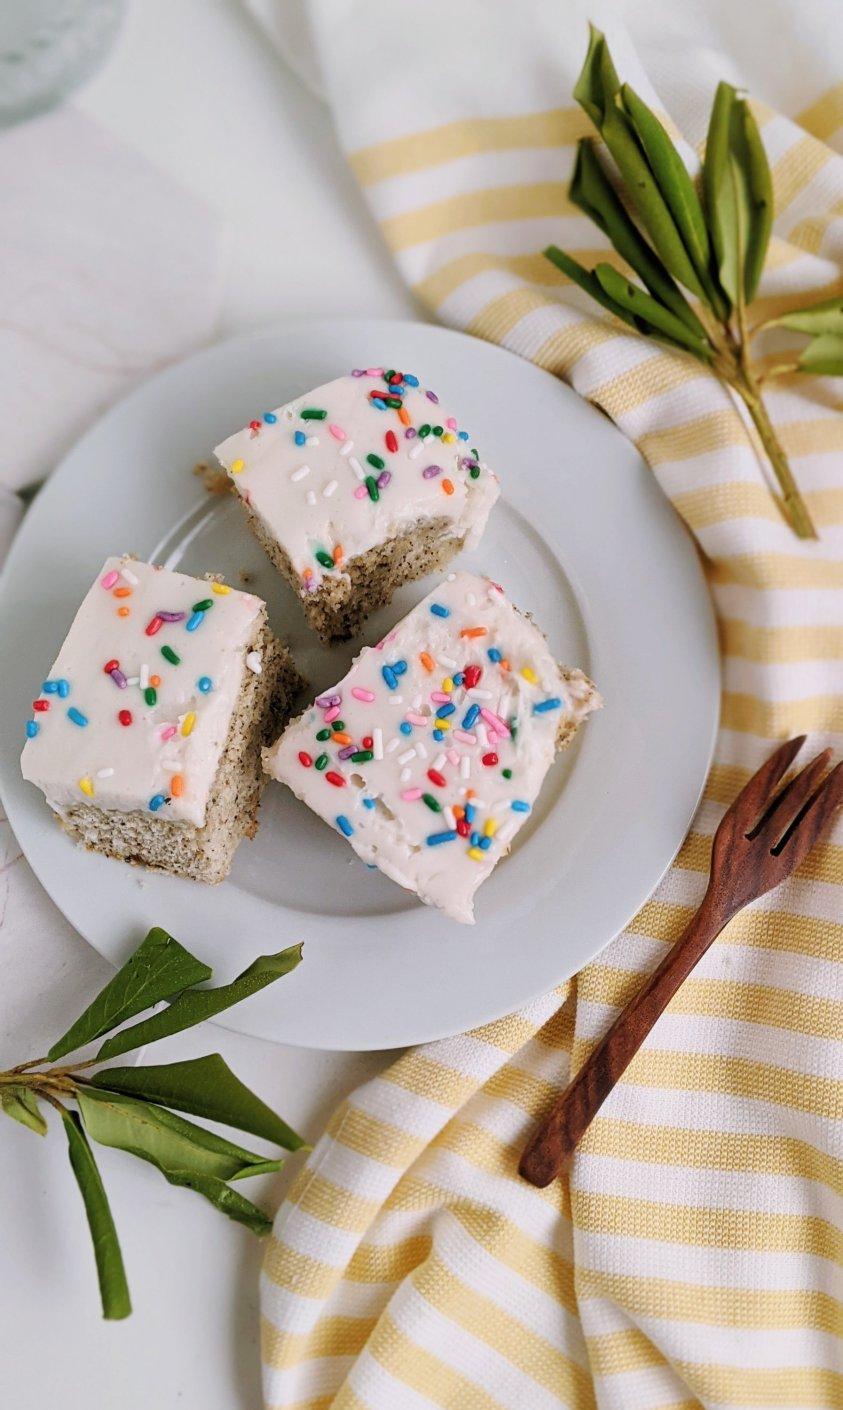 buttercream with no butter coconut milk cream vegan no dairy gluten free healthy